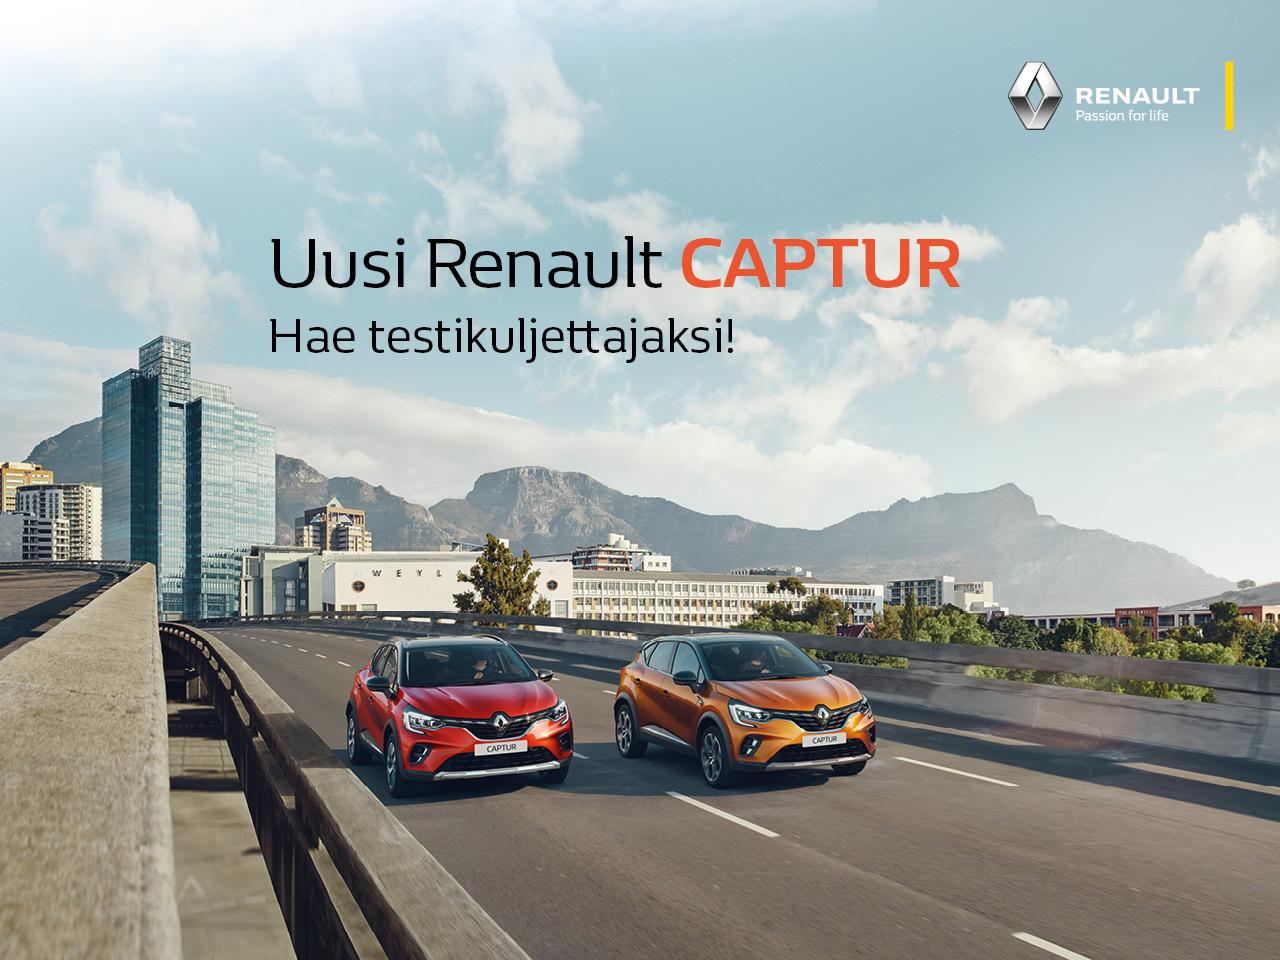 Hae Renault Captur -testikuljettajaksi